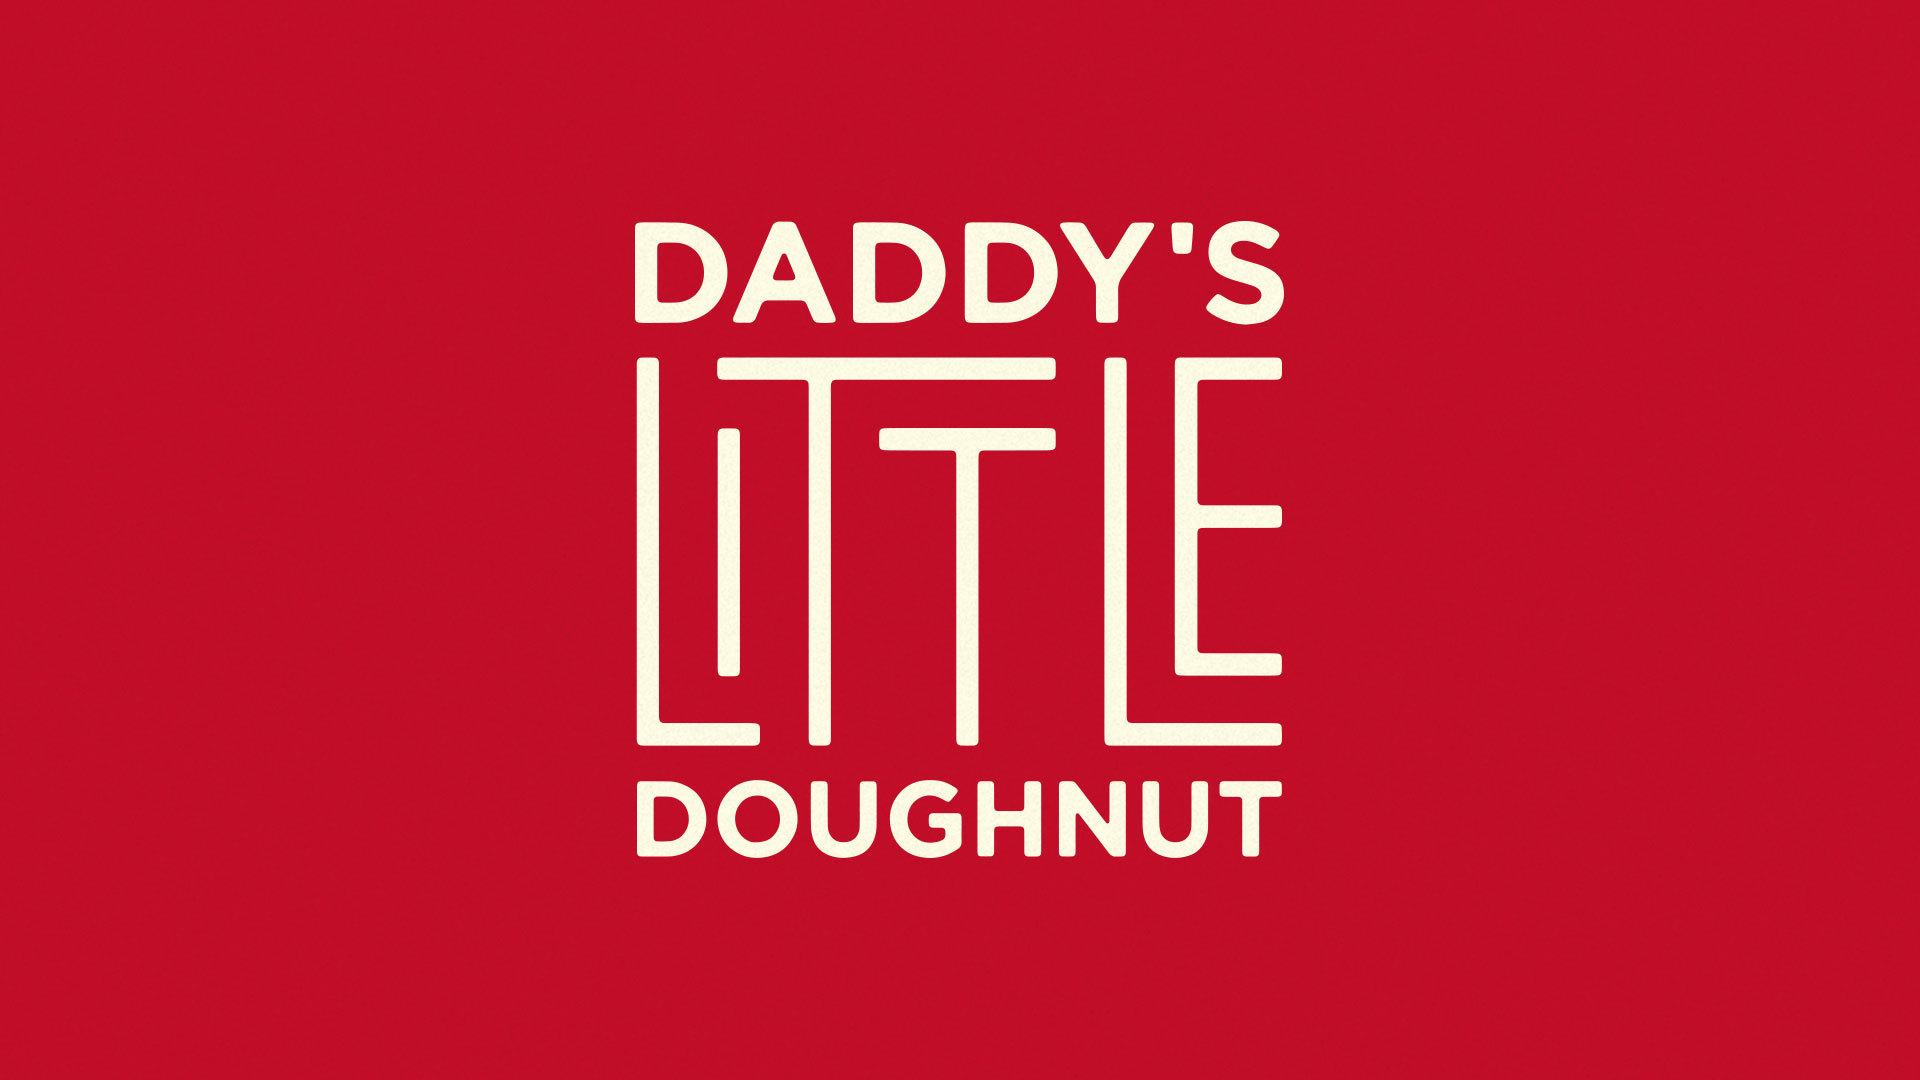 Krispykreme Daddys Doughnut